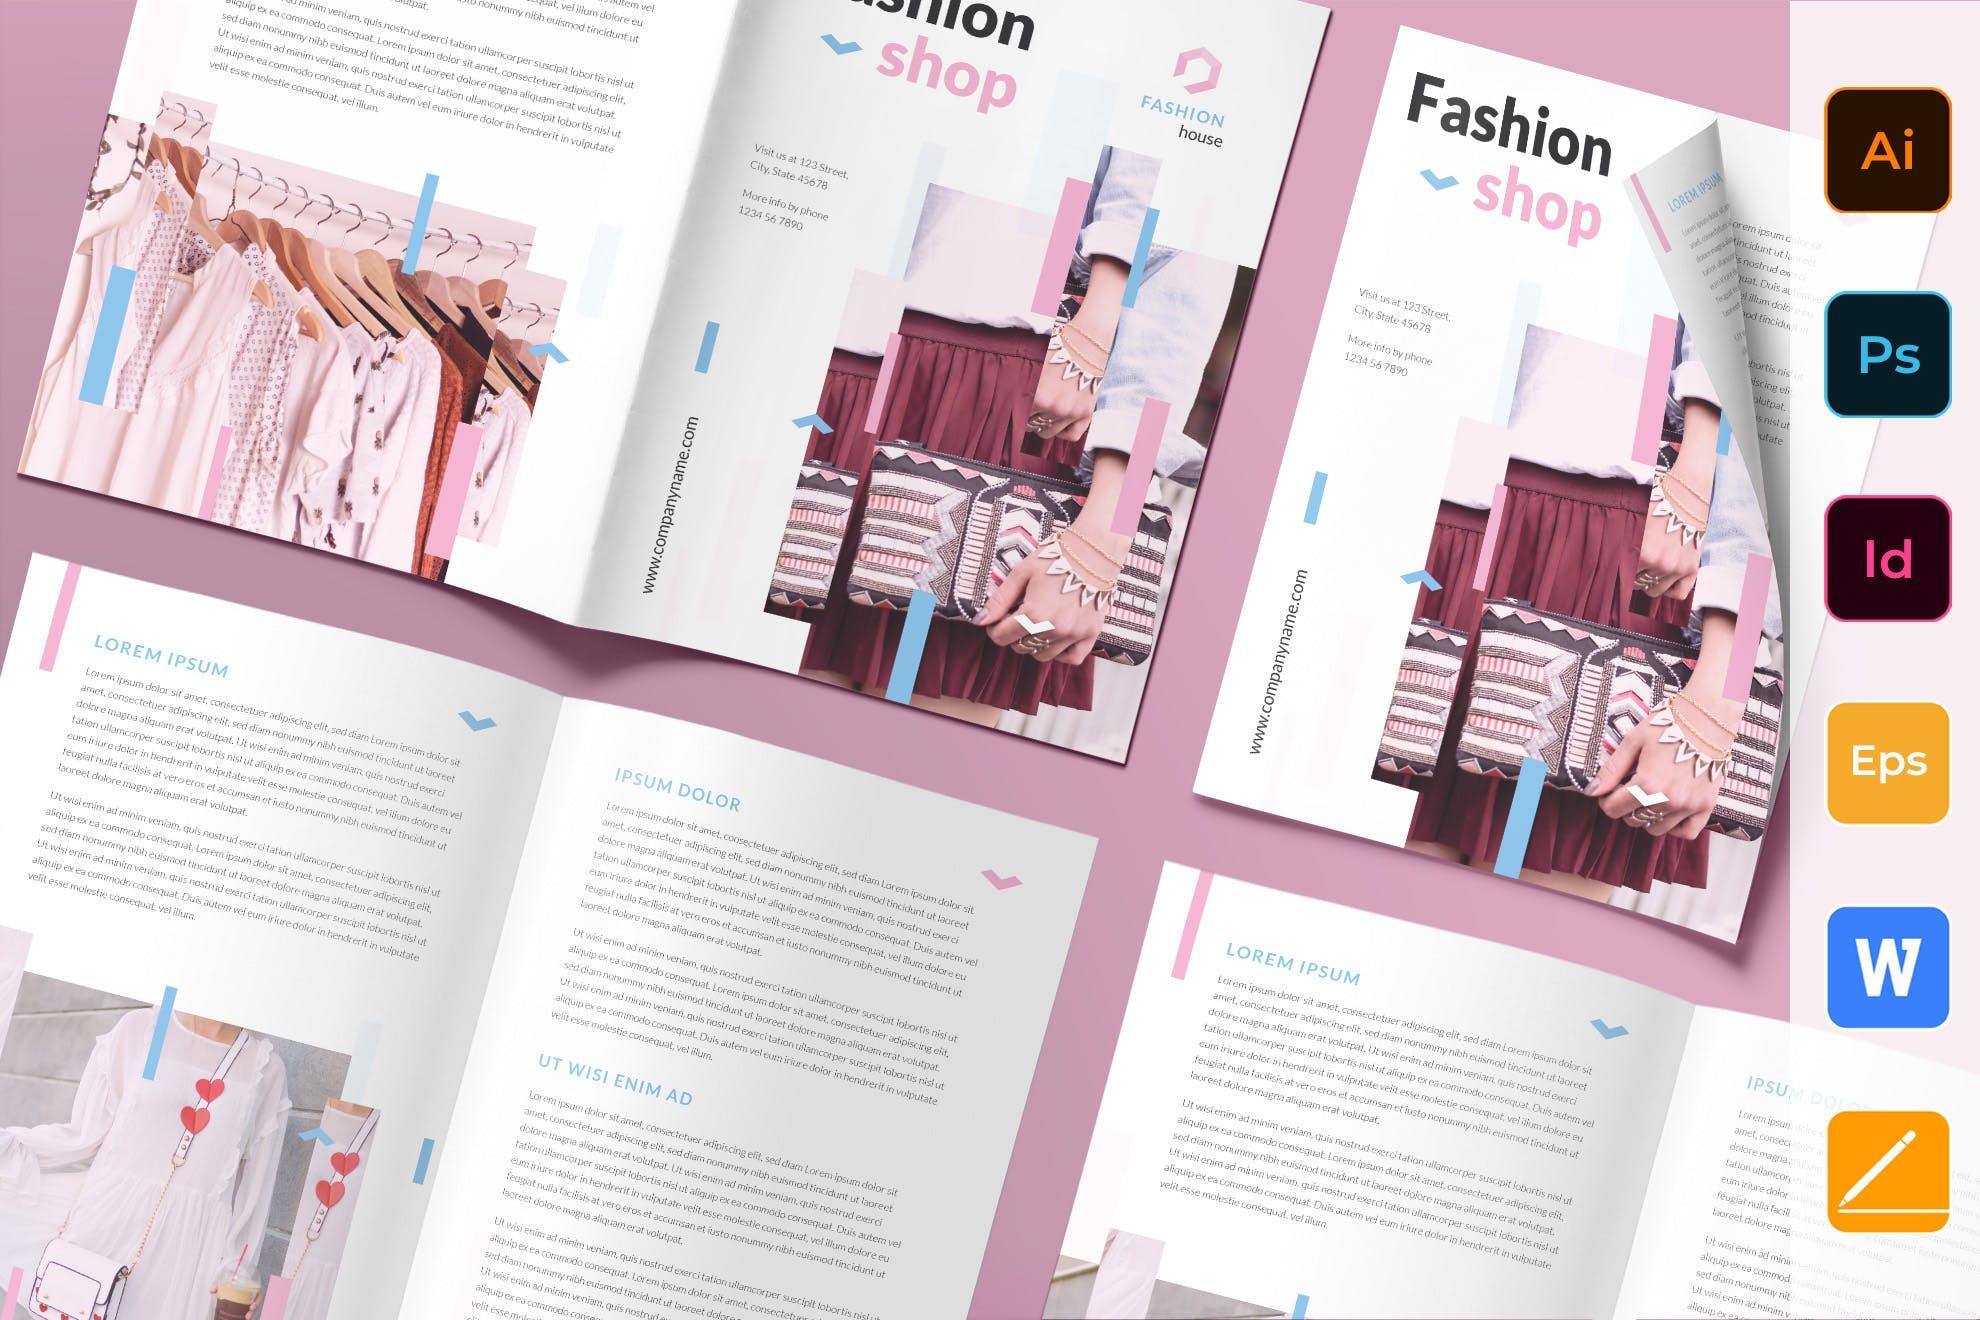 Fashion Shop brochure template